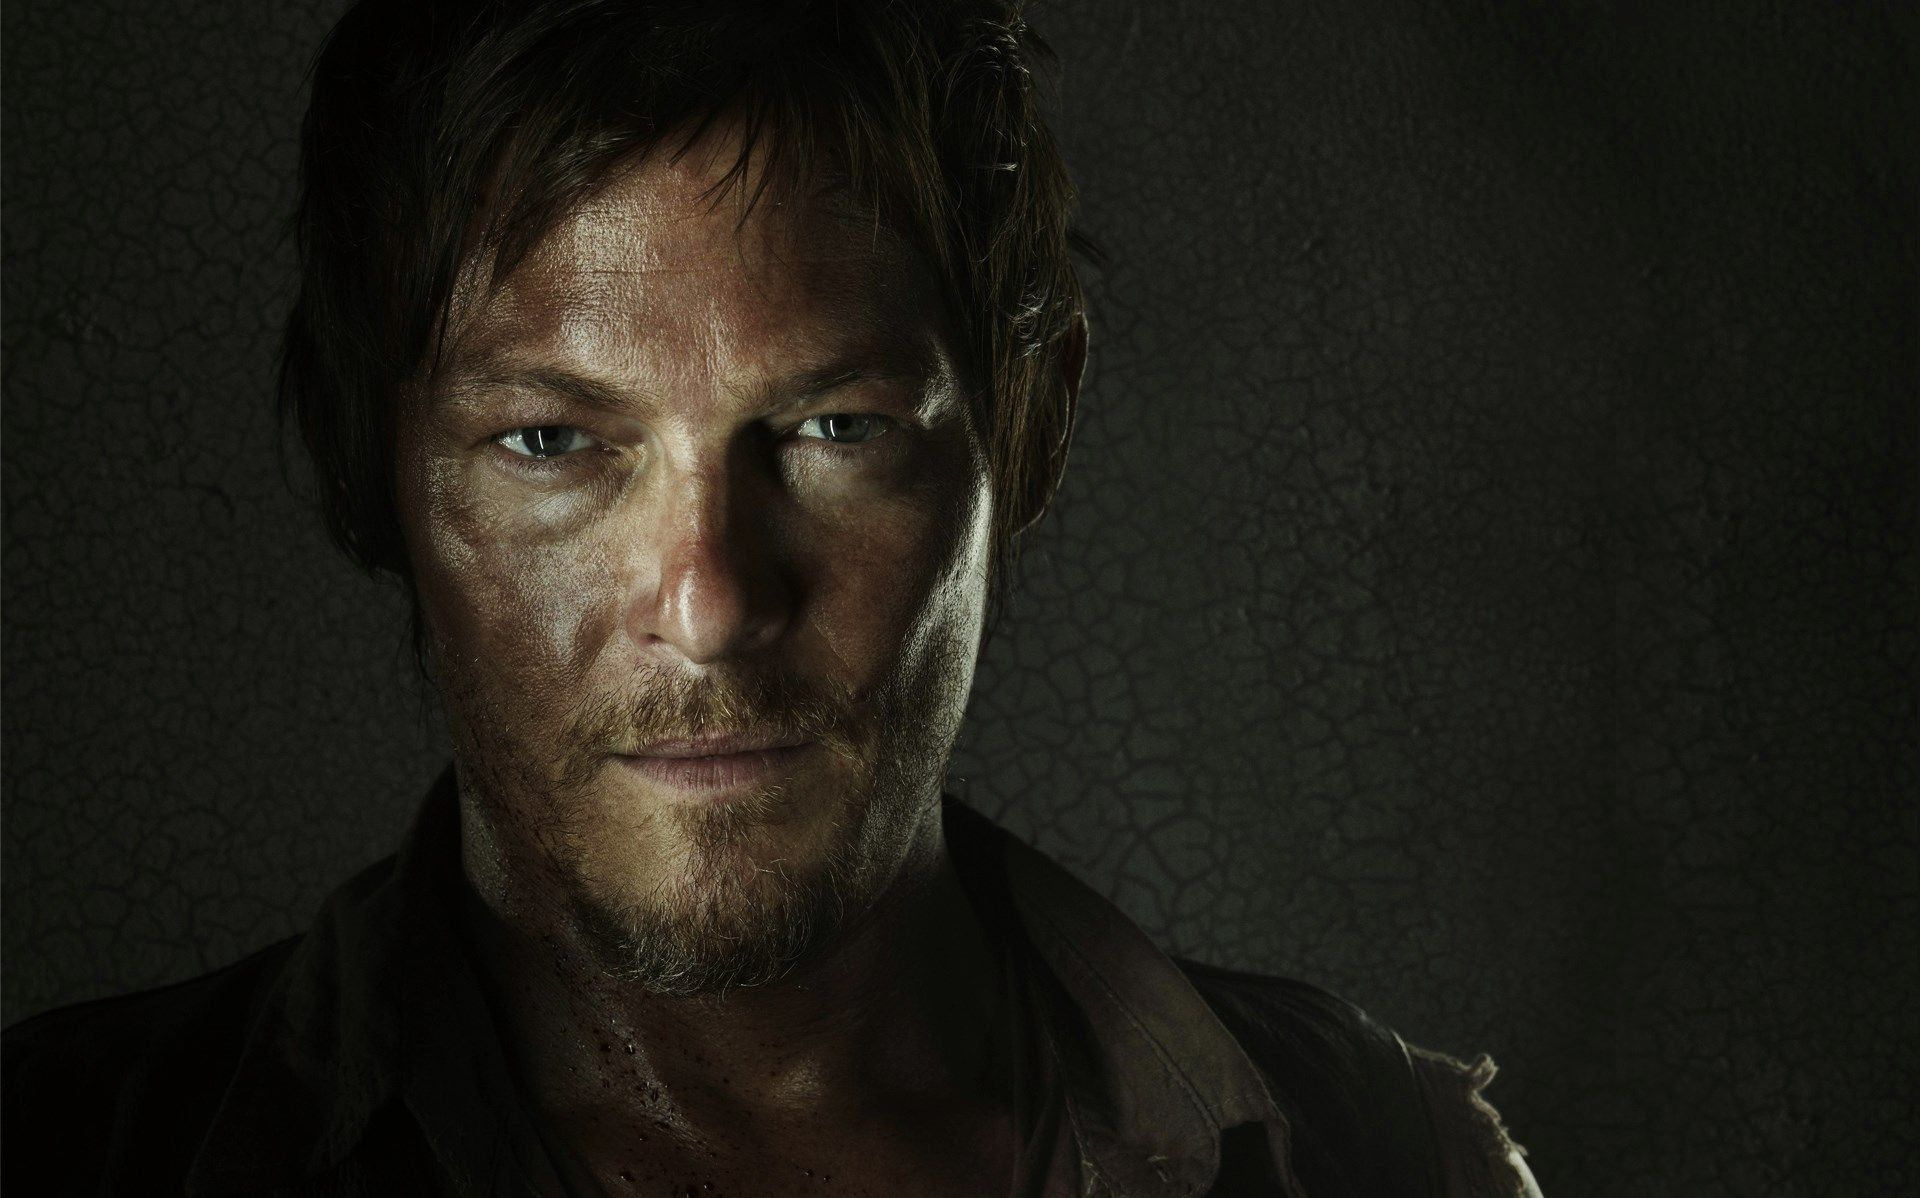 The Walking Dead Daryl Dixon Wallpaper